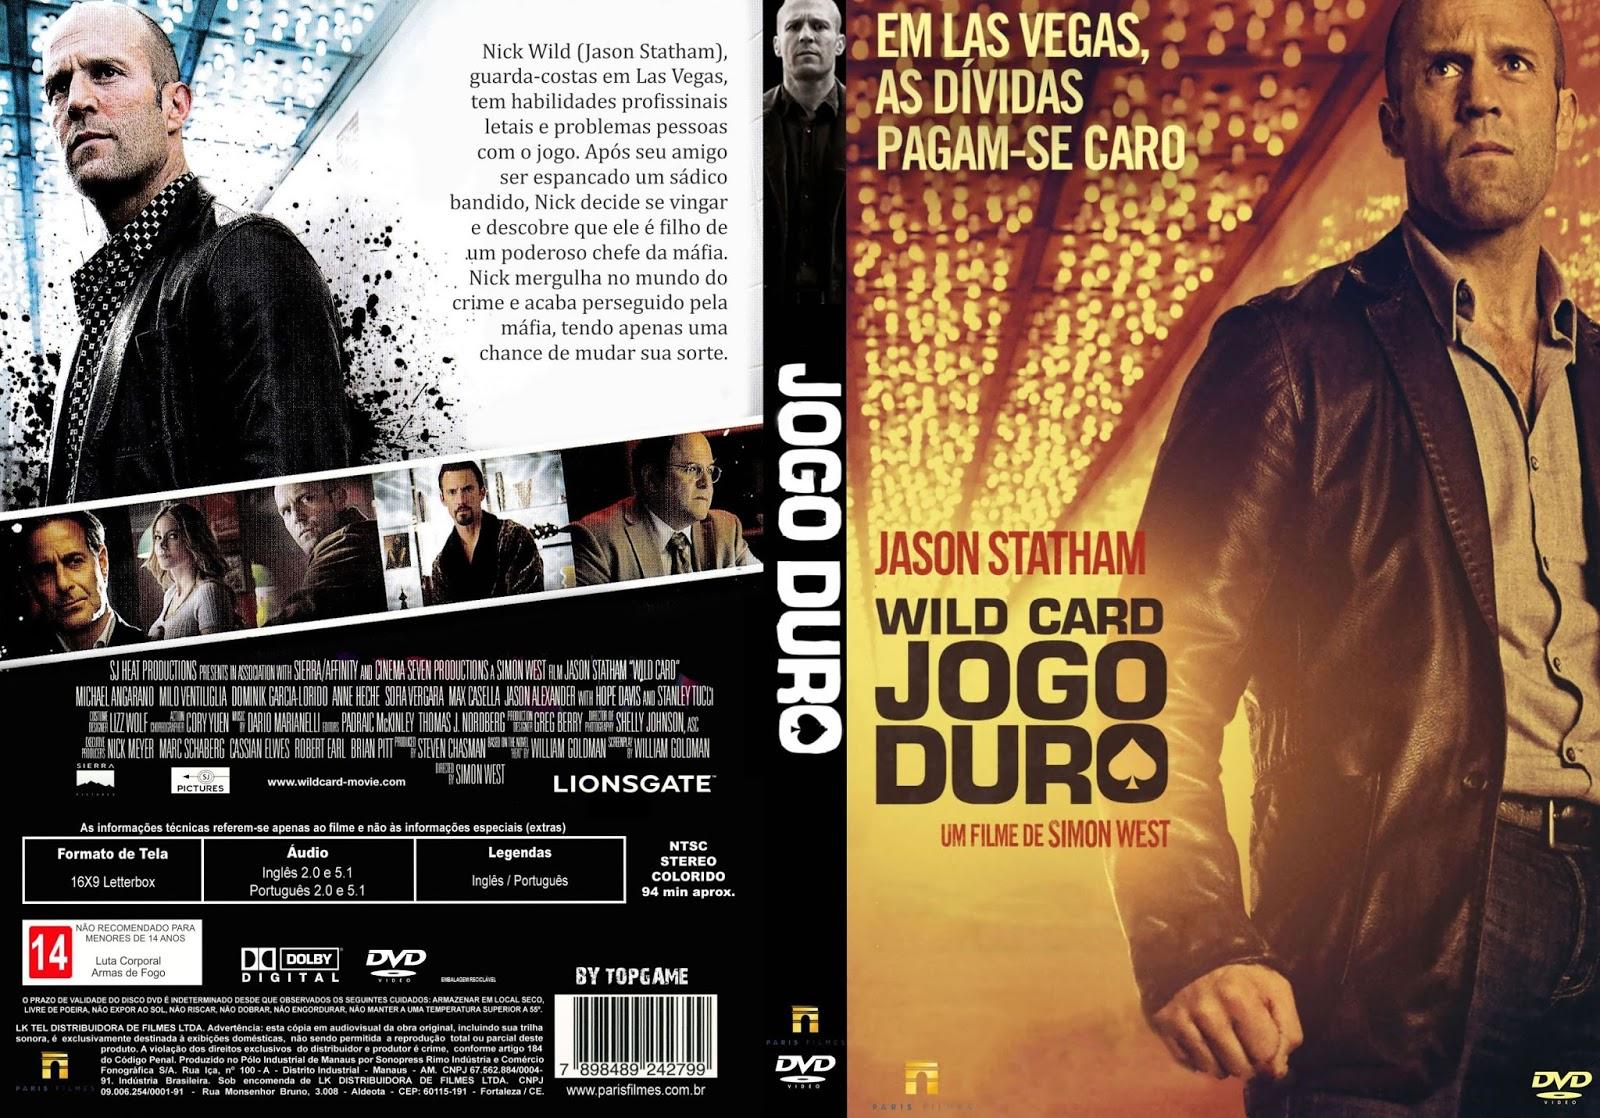 Jogo Duro DVD-R Jogo 2BDuro